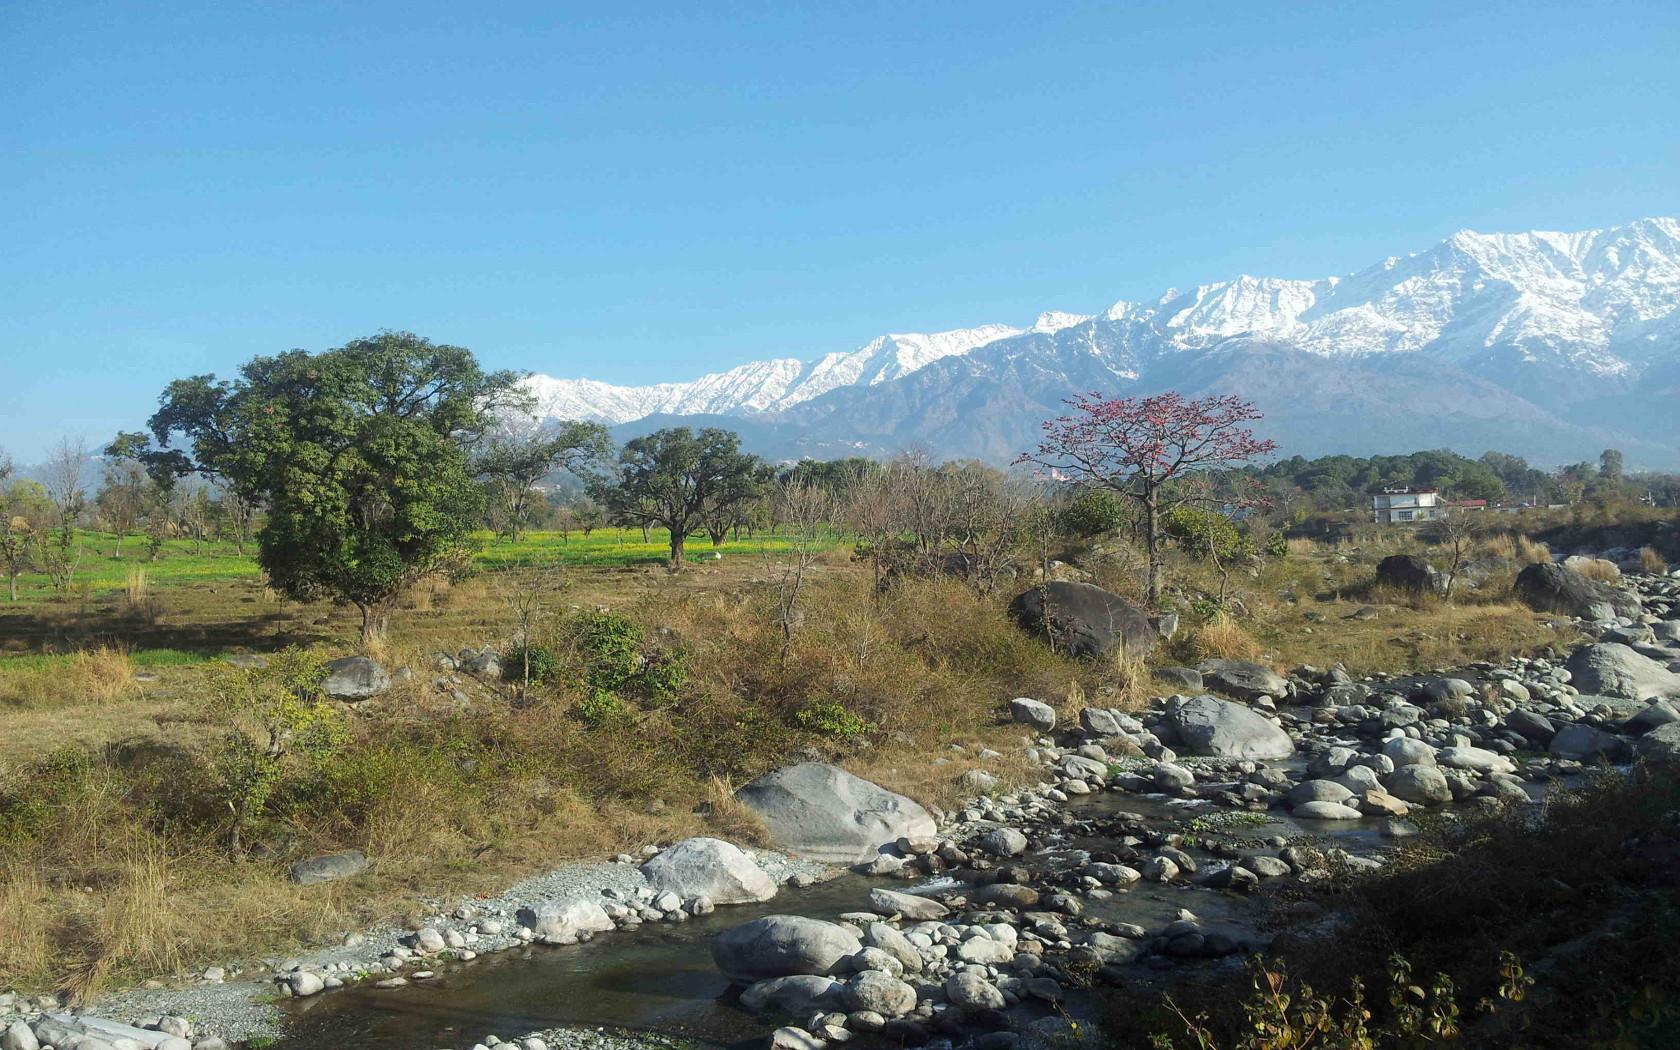 Experiências e objetivo de Dharamsala e Tso Pema